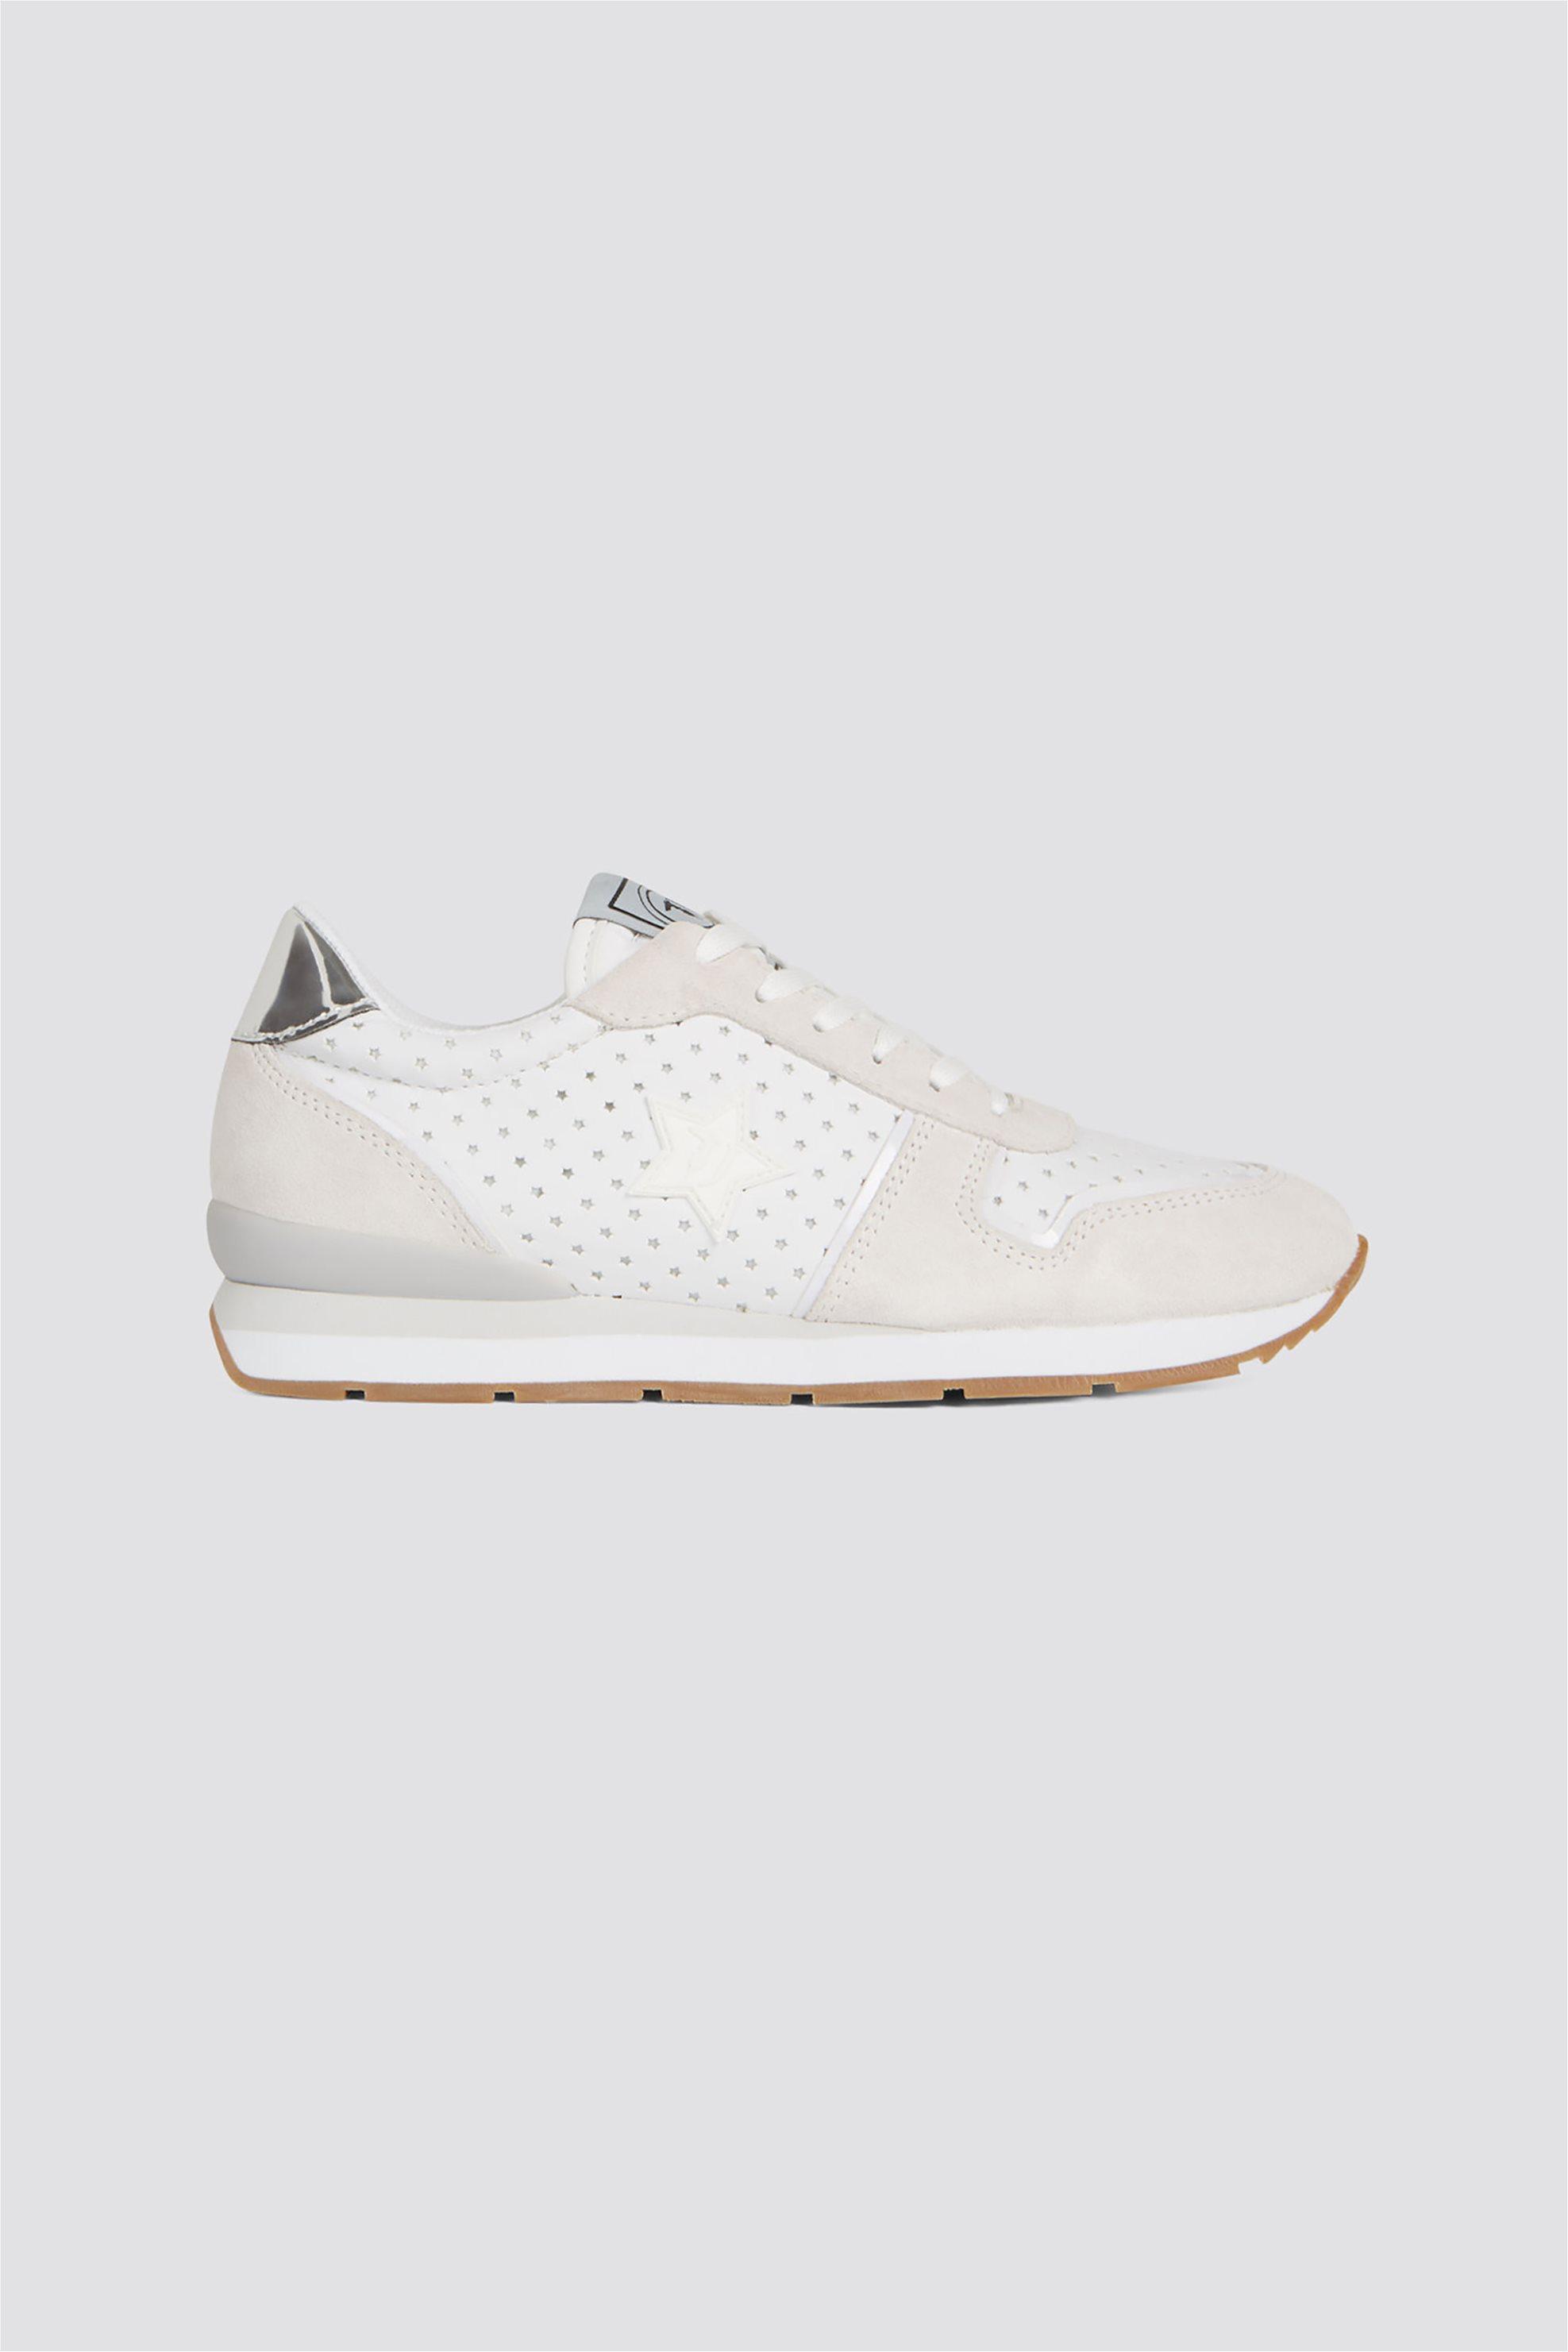 Trussardi Jeans γυναικεία δερμάτινα sneakers με cut αστέρια – 79A00322-9Y099999 – Λευκό